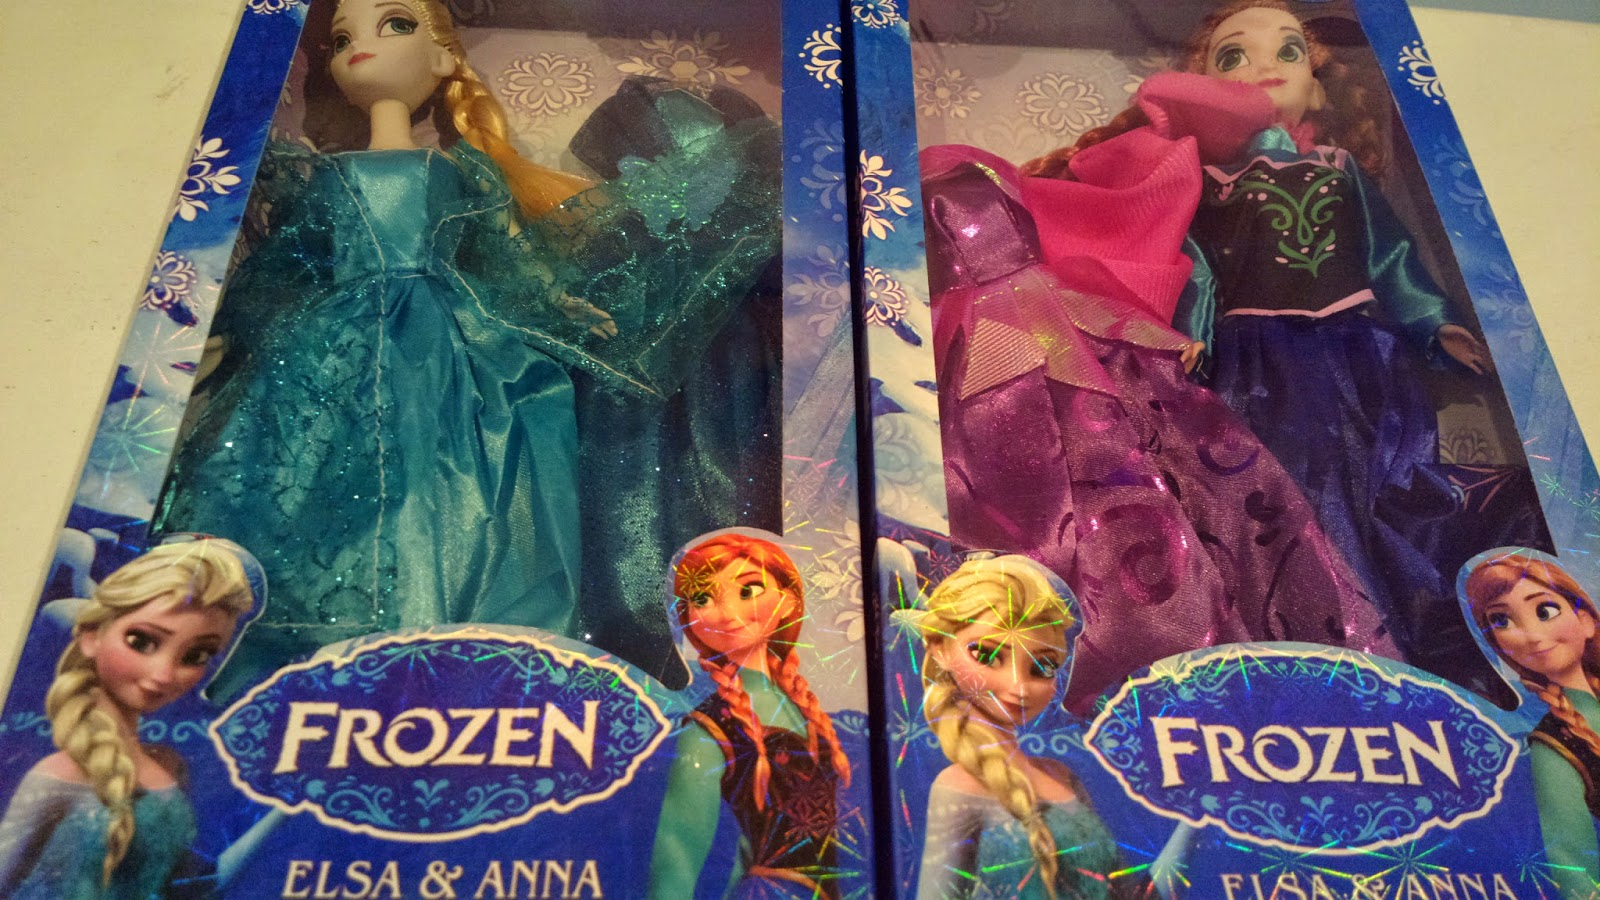 Frozen's Elsa and Anna dolls